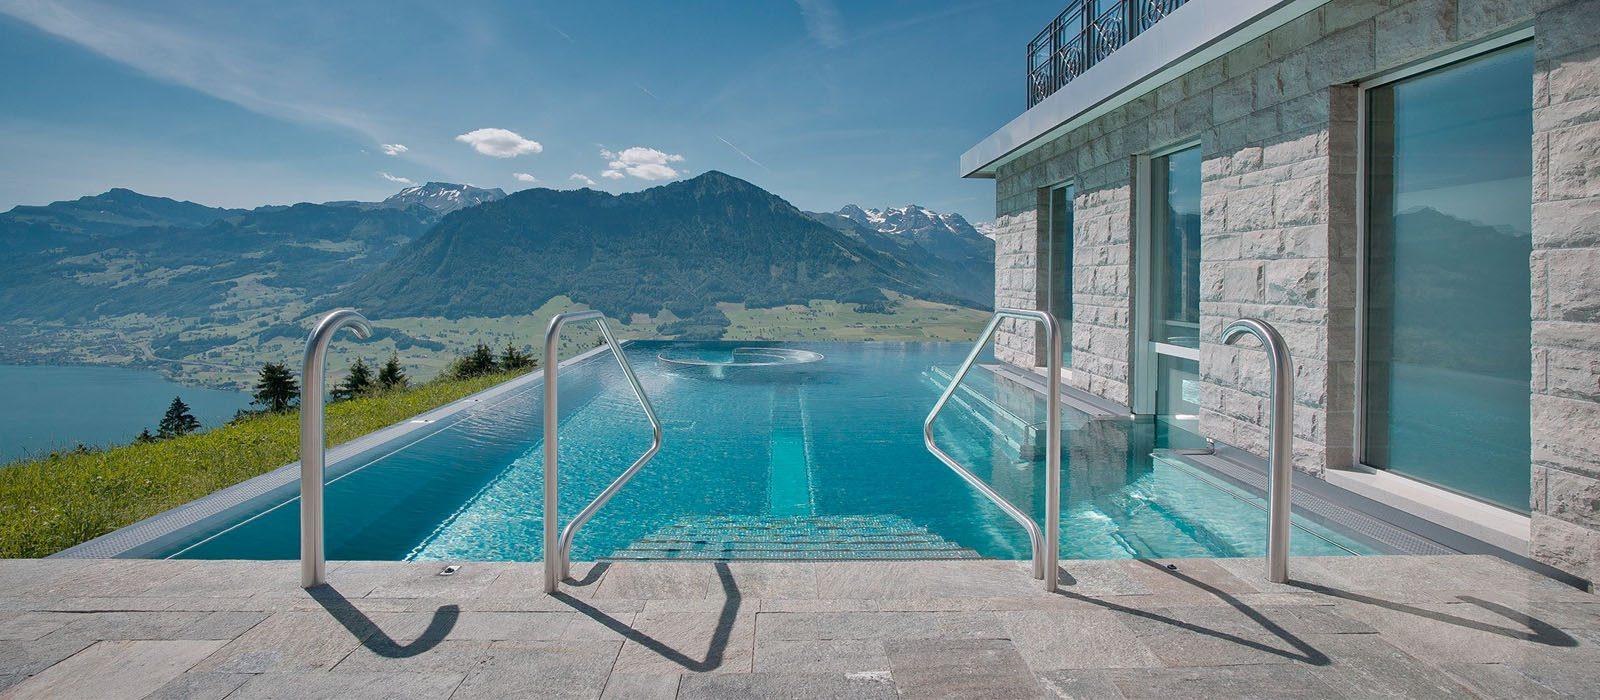 Luxury Switzerland Holiday Packages Hotel Villa Honegg Header1